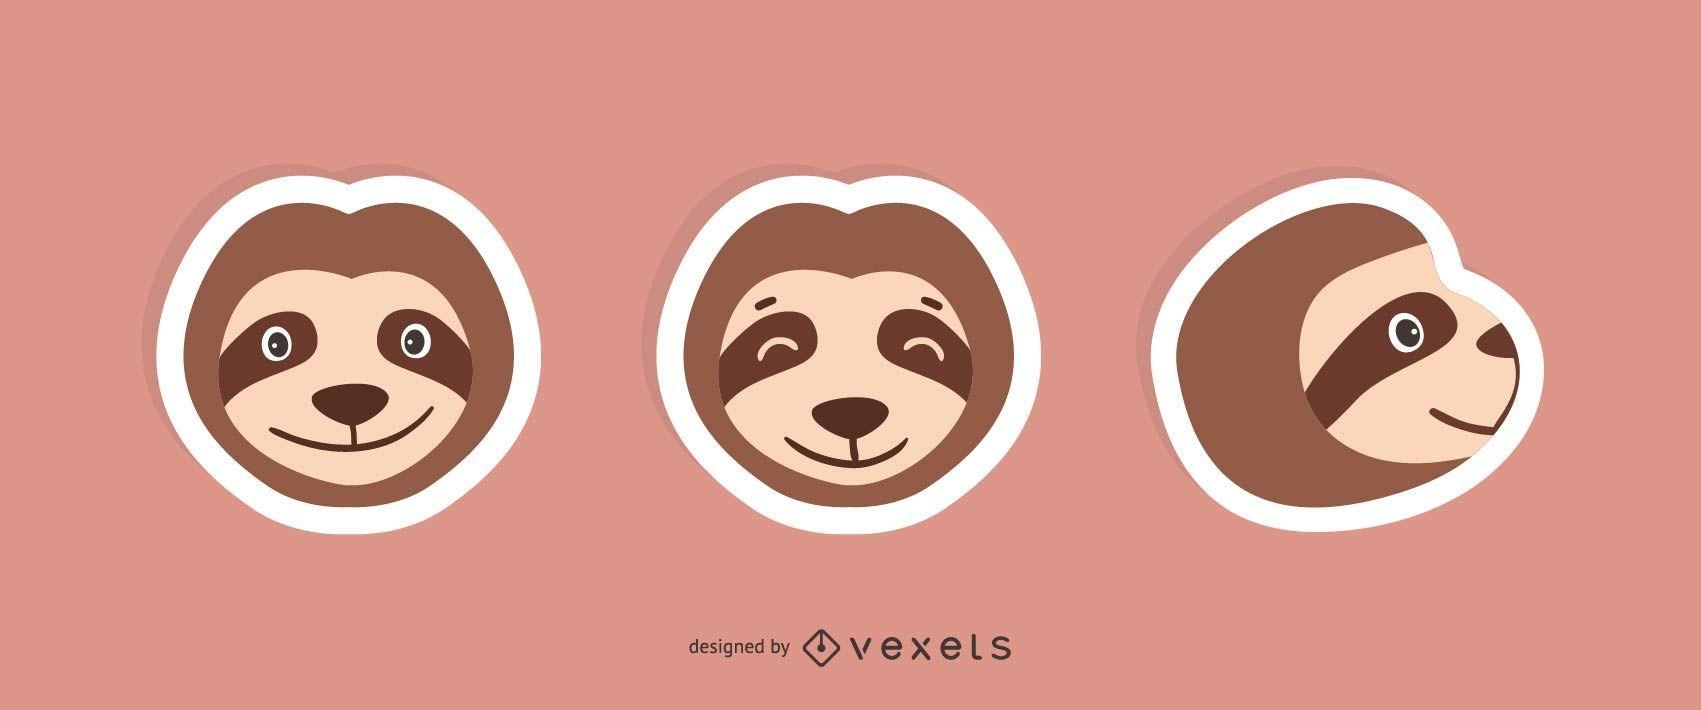 Sloth Sticker Set